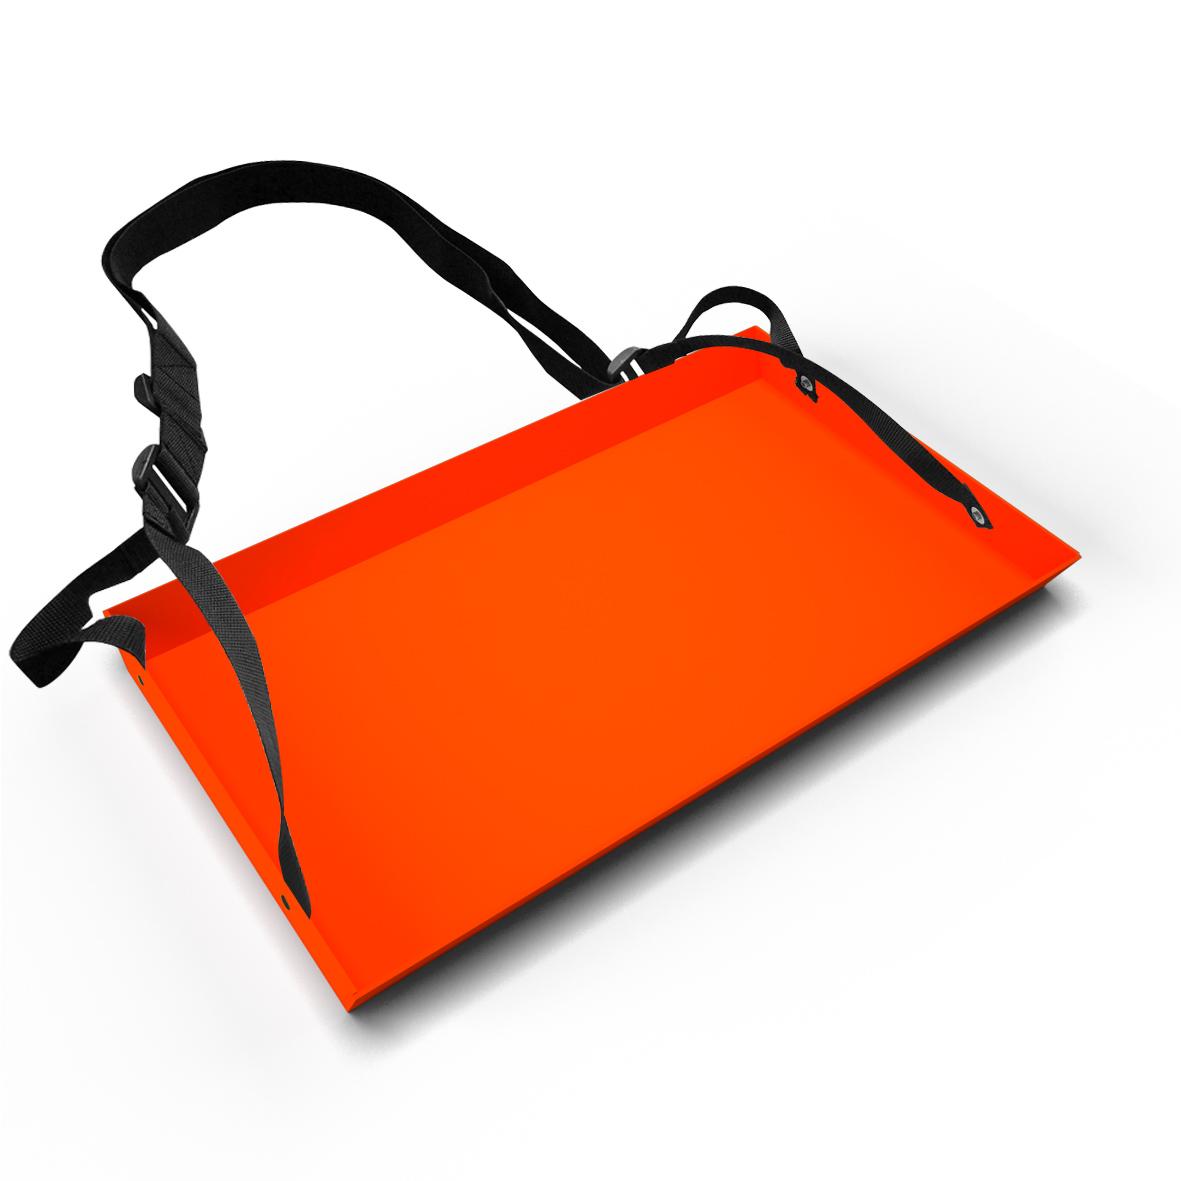 POP-LAYS-Promo-Berretto-JT160415-orange.jpg